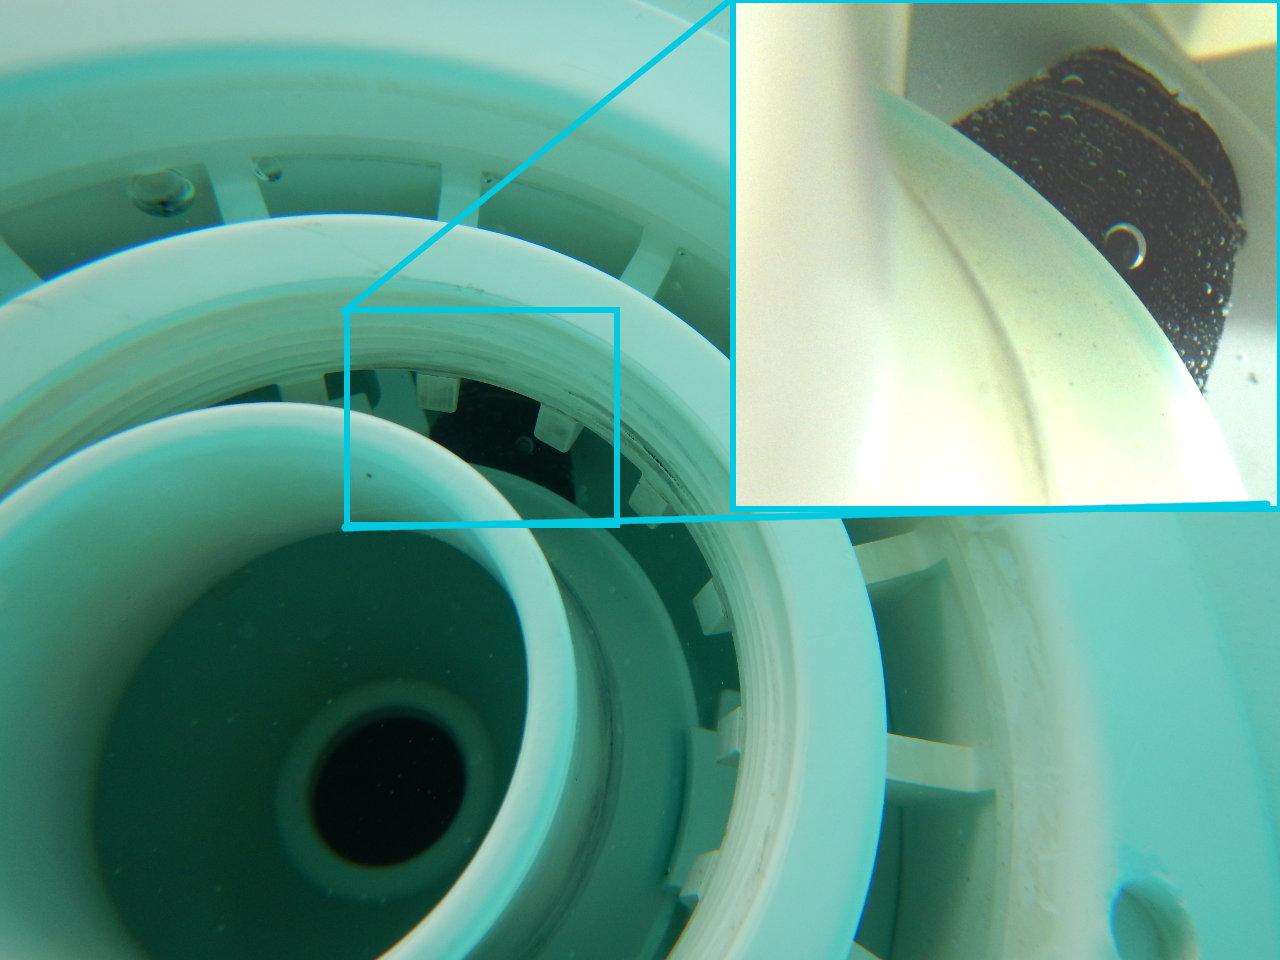 Fuite escawat turbojet - balnéo (RÉSOLU) Bouchon_turbojet_enplace